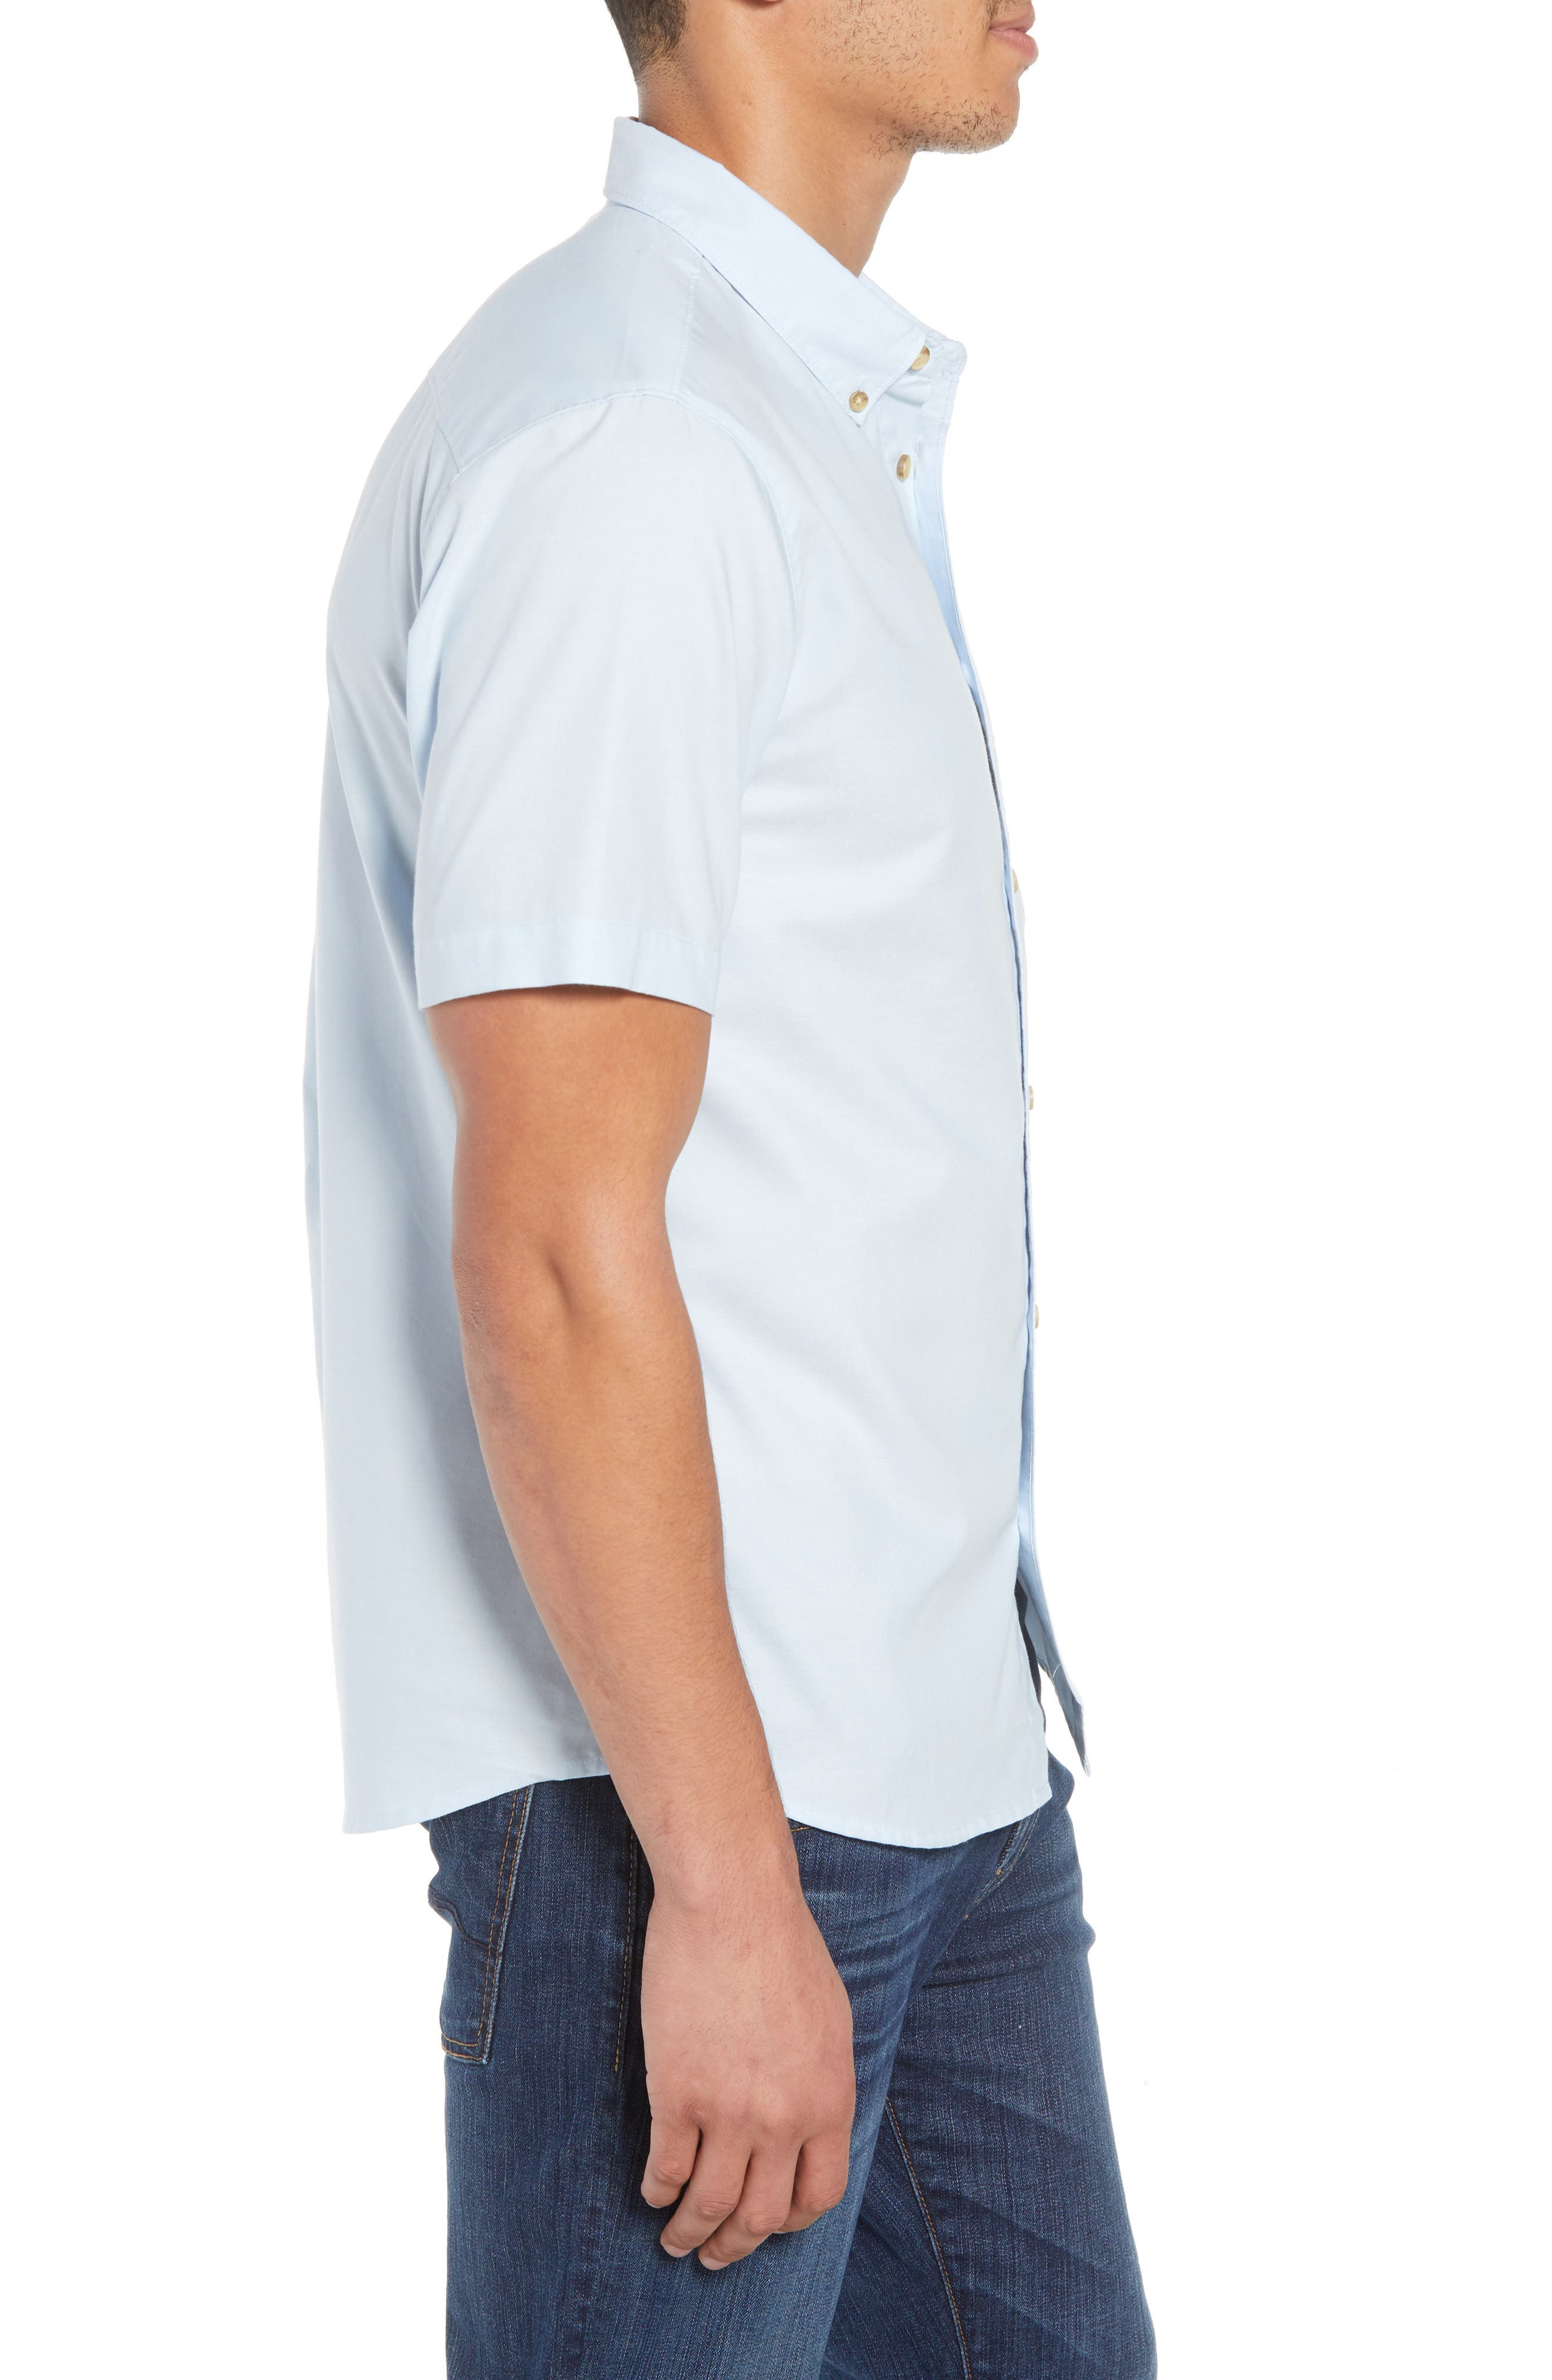 Banks Woven Shirt,                             Alternate thumbnail 3, color,                             LIGHT BLUE